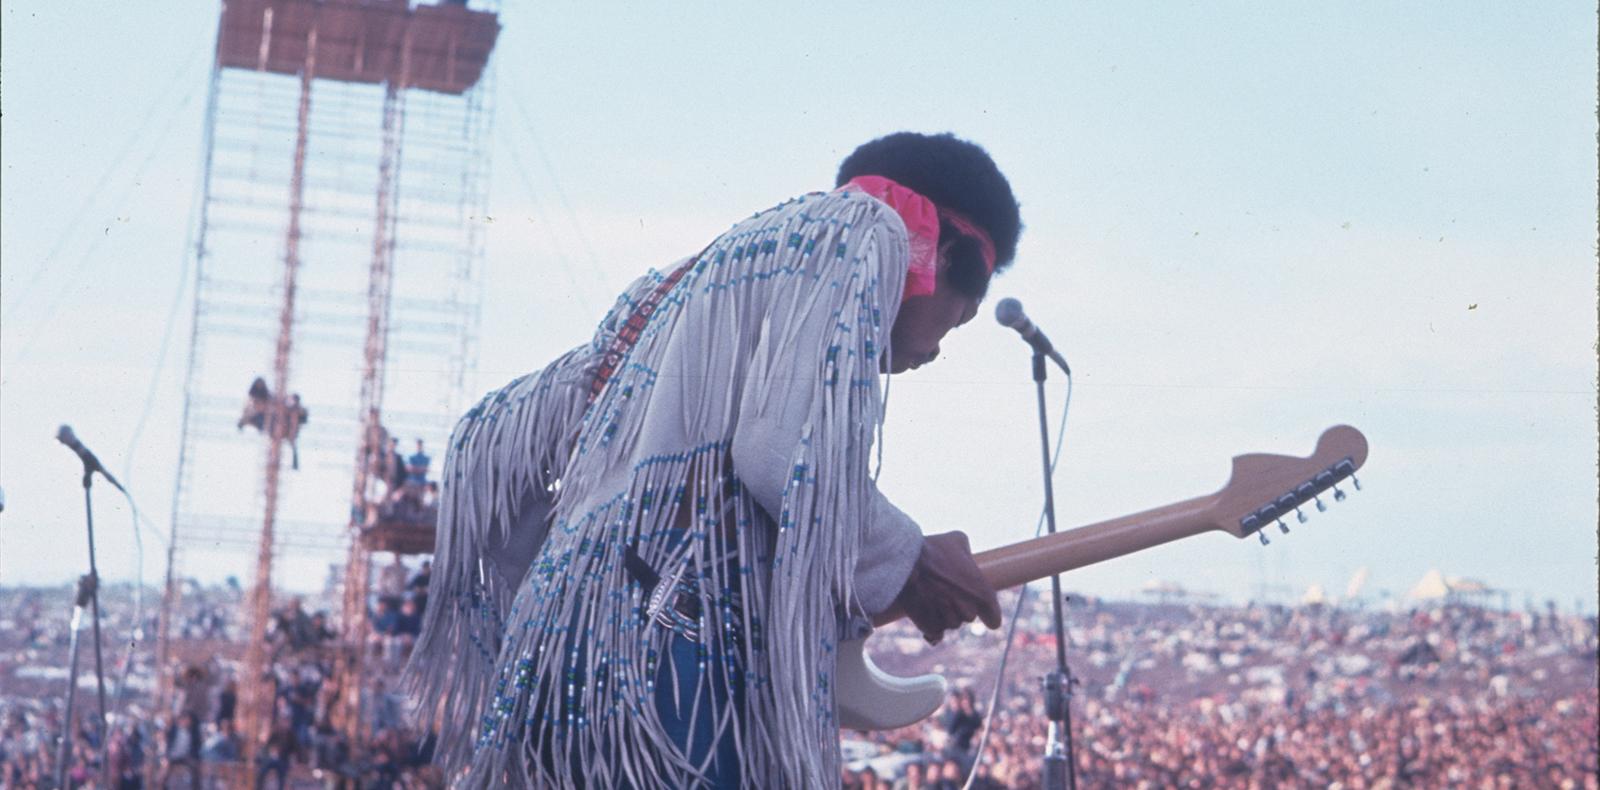 Jimi Hendrix, lors de la première édition du festival Woodstock, en août 1969. Photo : Jonathan Stathakis